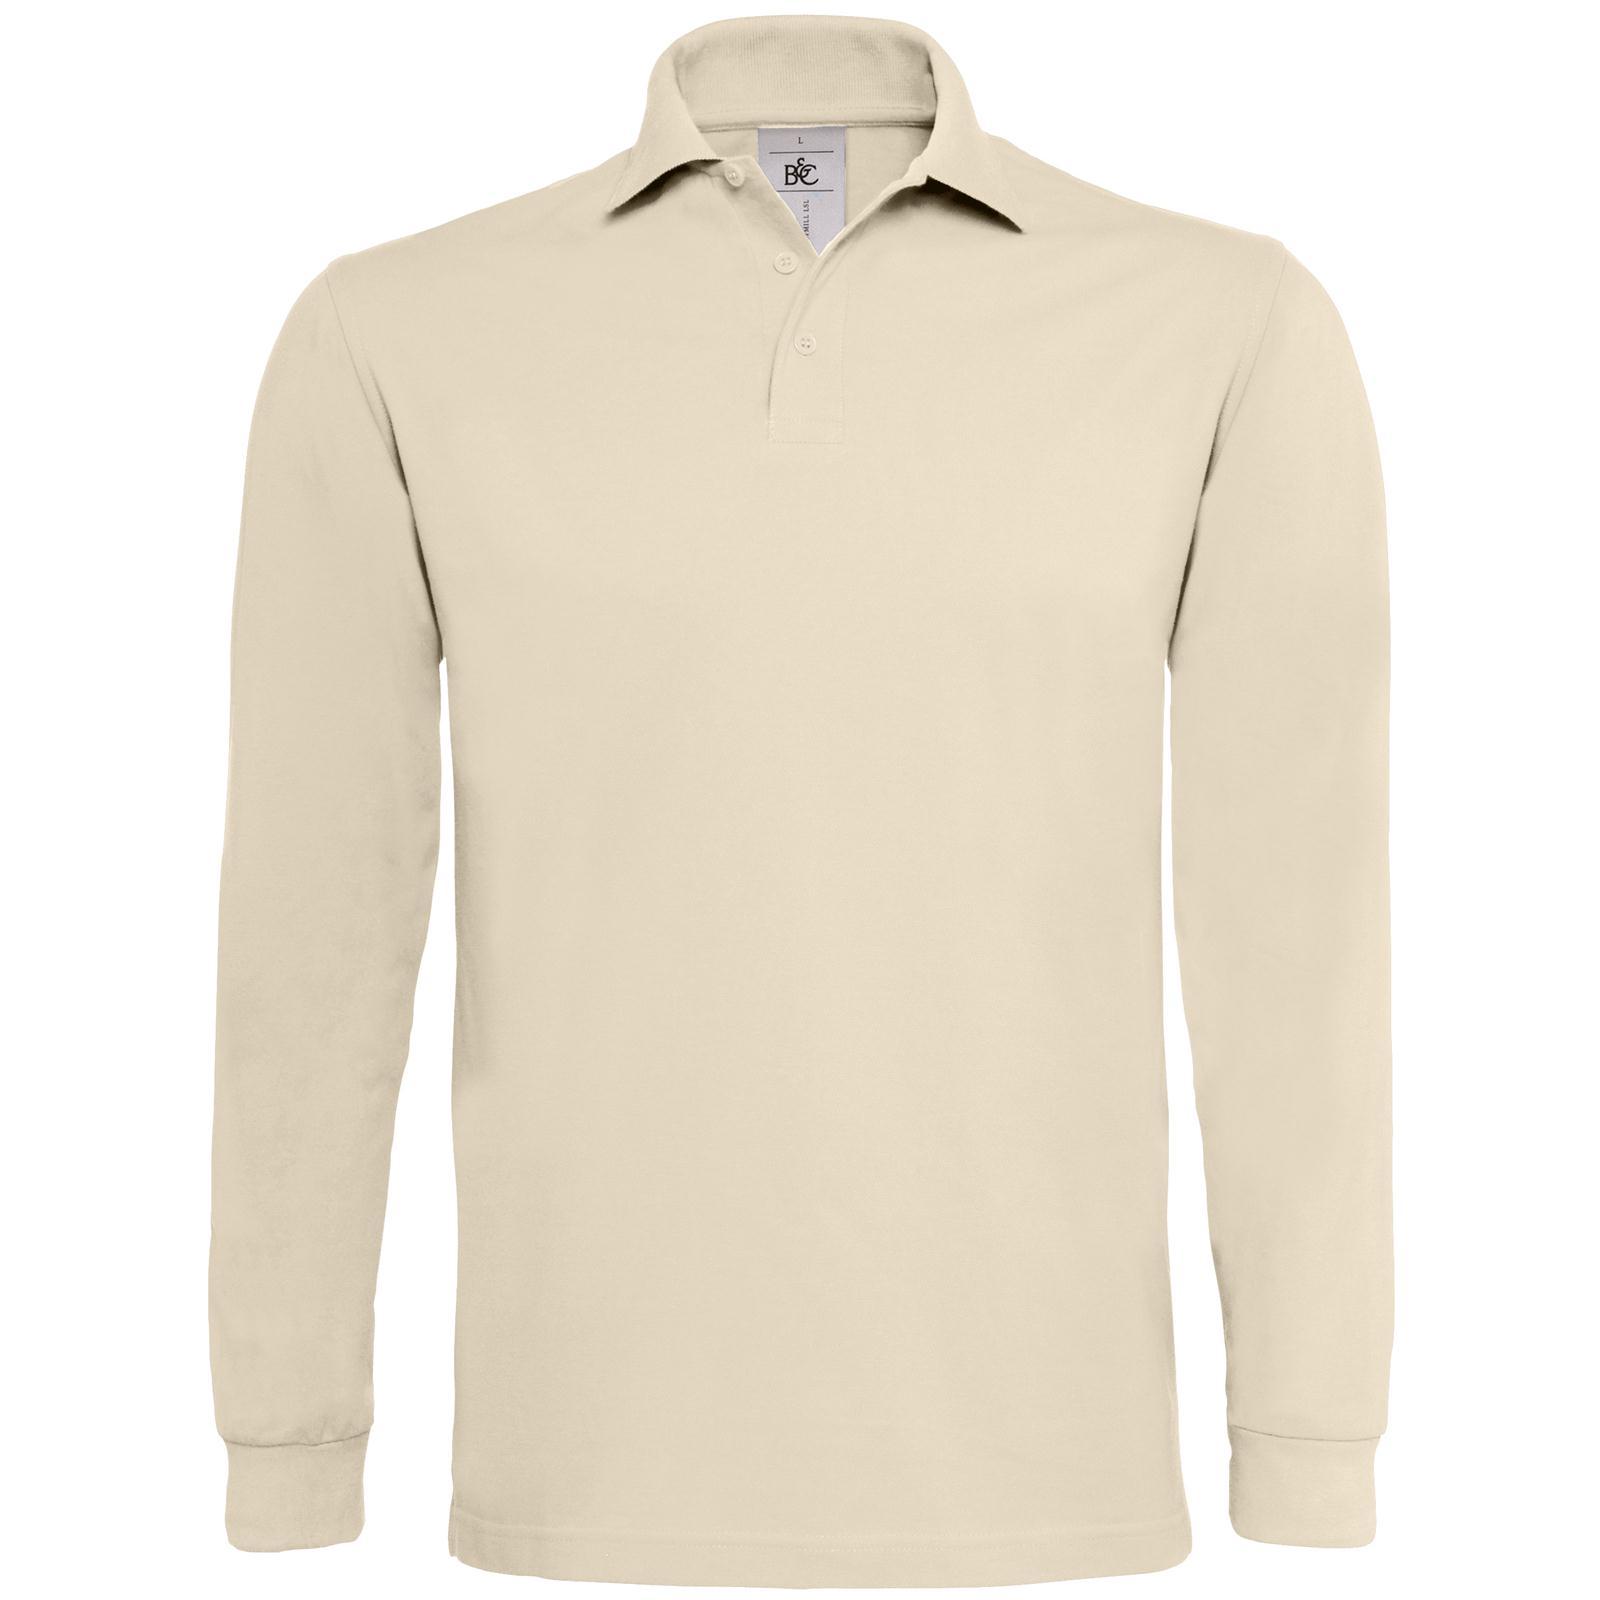 New b c mens heavymill cotton long sleeve pique polo shirt for Mens long sleeve pique polo shirts